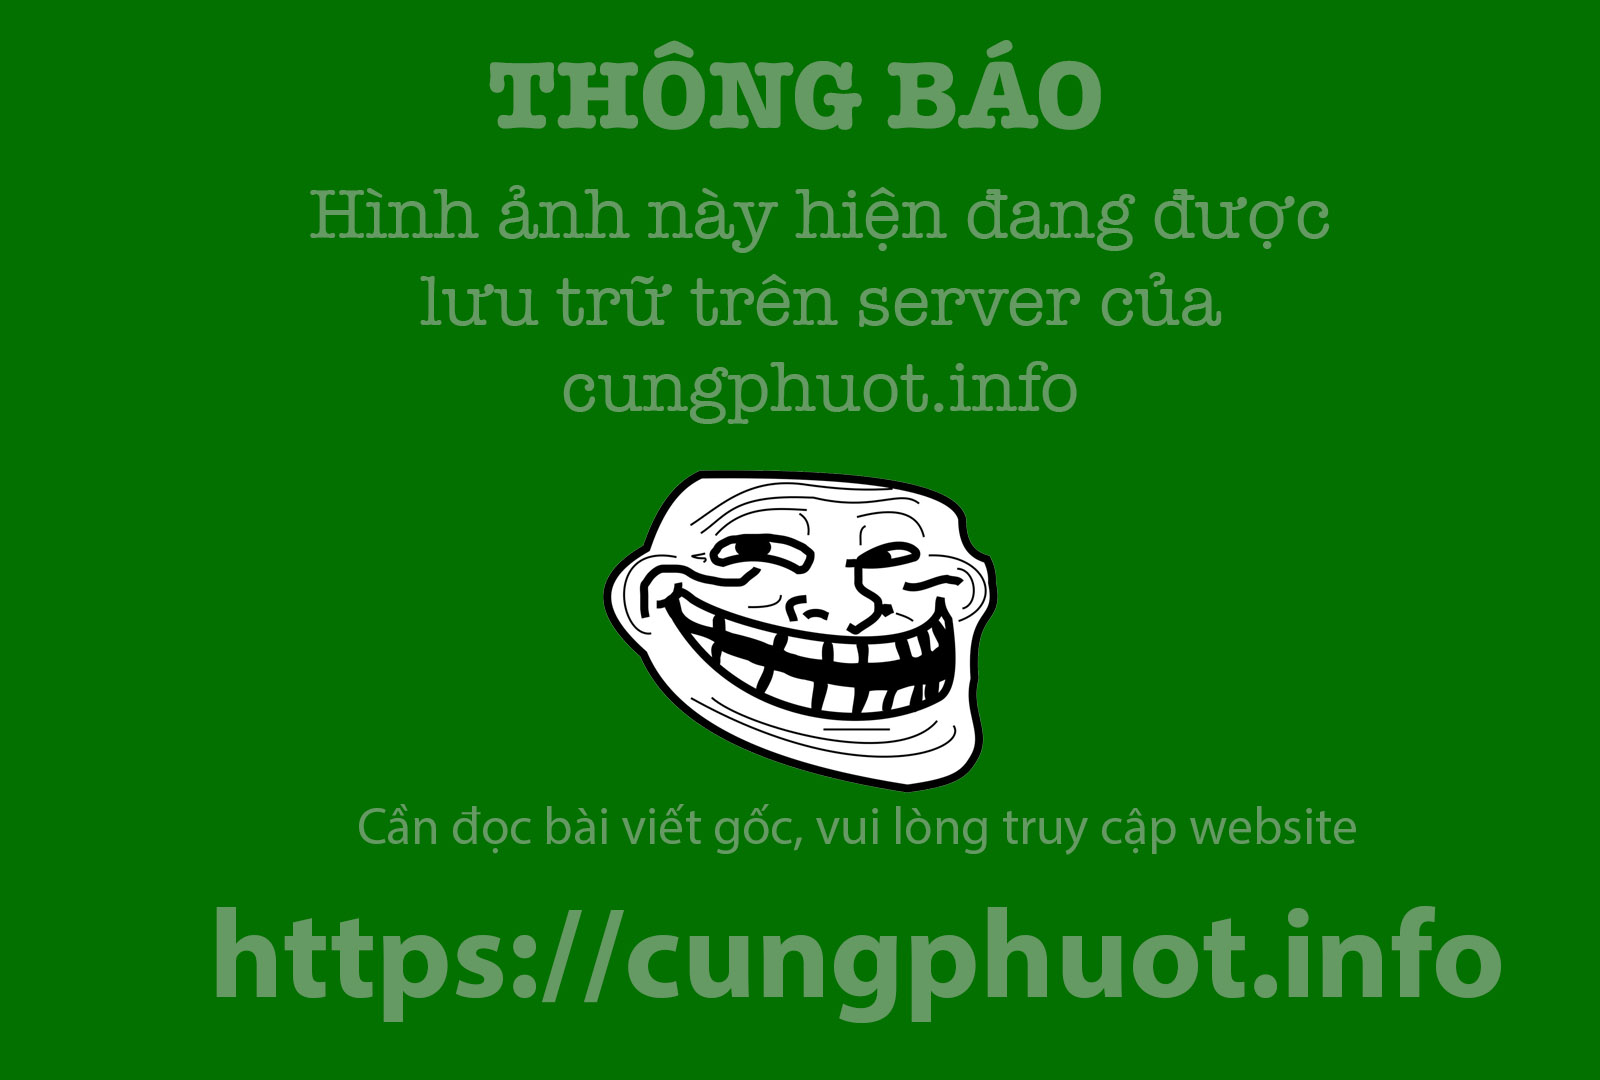 Vuon hoa tam giac mach o Ninh Binh hinh anh 4